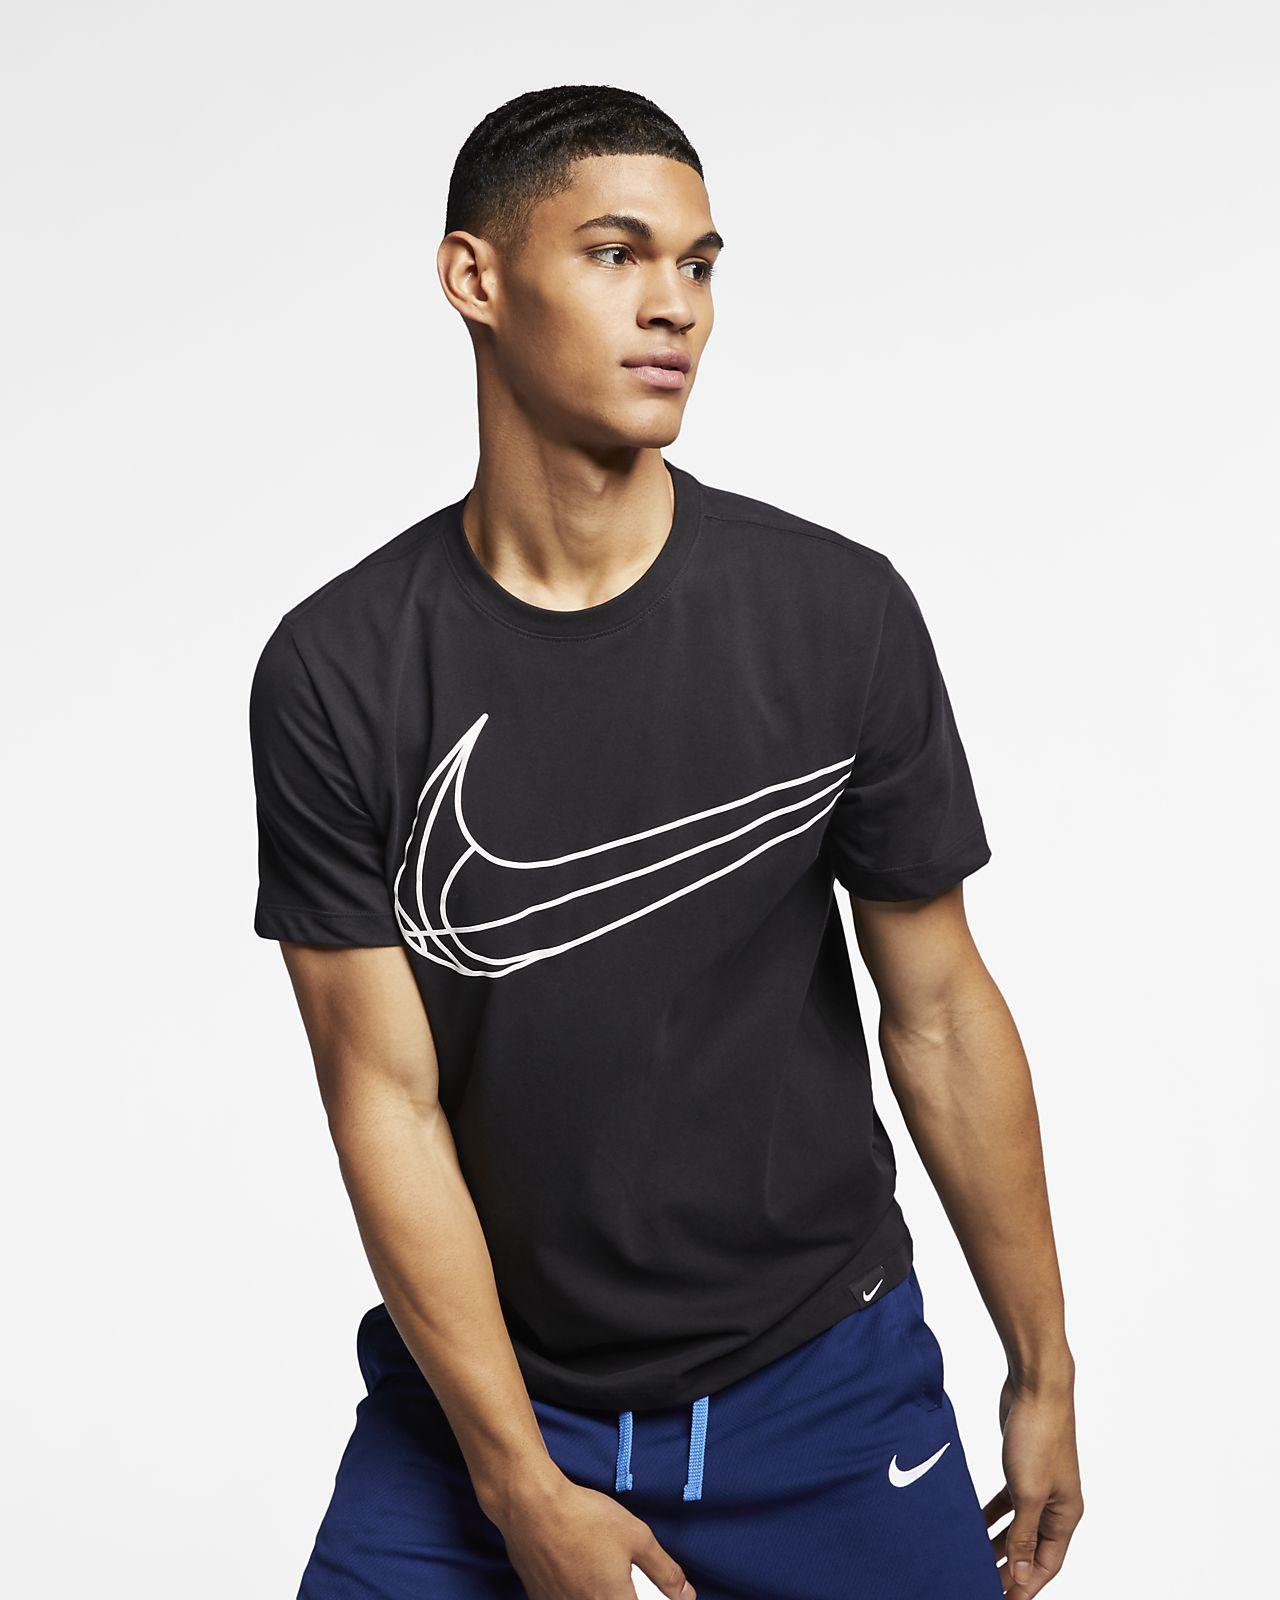 171bb2aab2c1c T-shirt da basket Nike Dri-FIT - Uomo. Nike.com IT